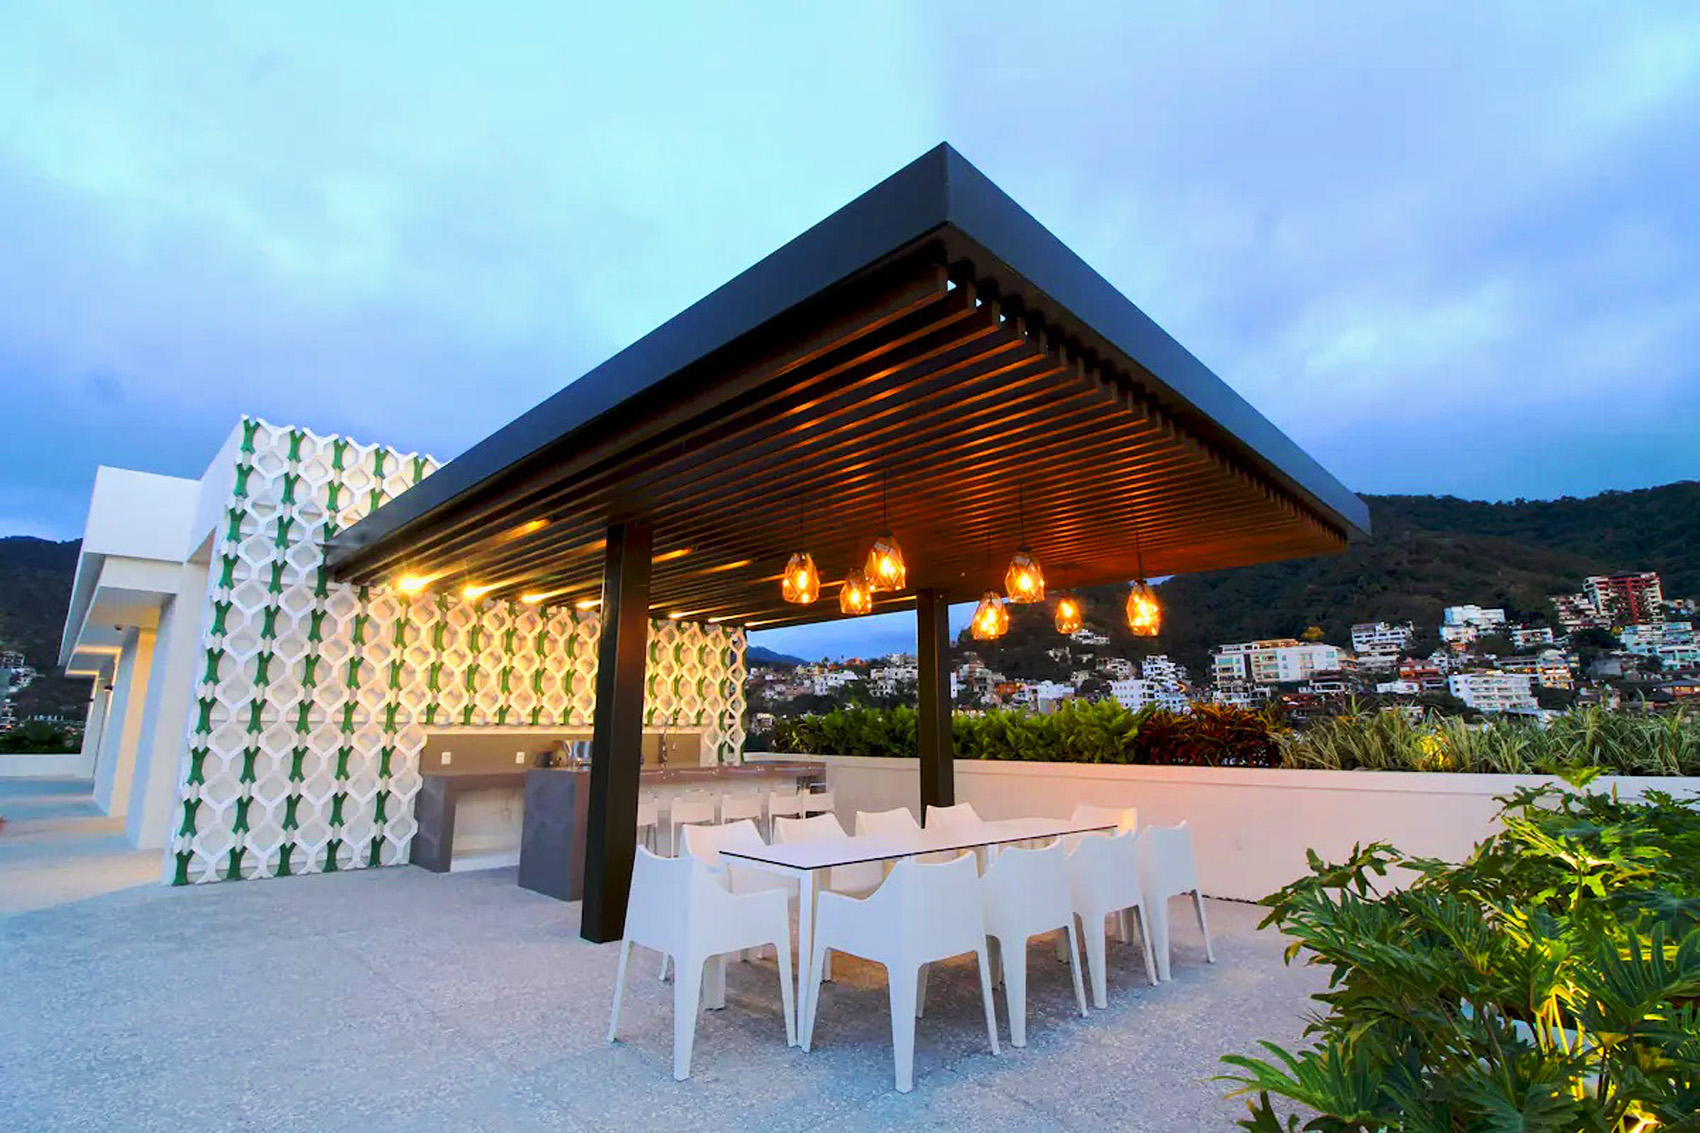 Condo Avida 410 - Romantic Zone Furnished Condo Old Town Puerto Vallarta (71)